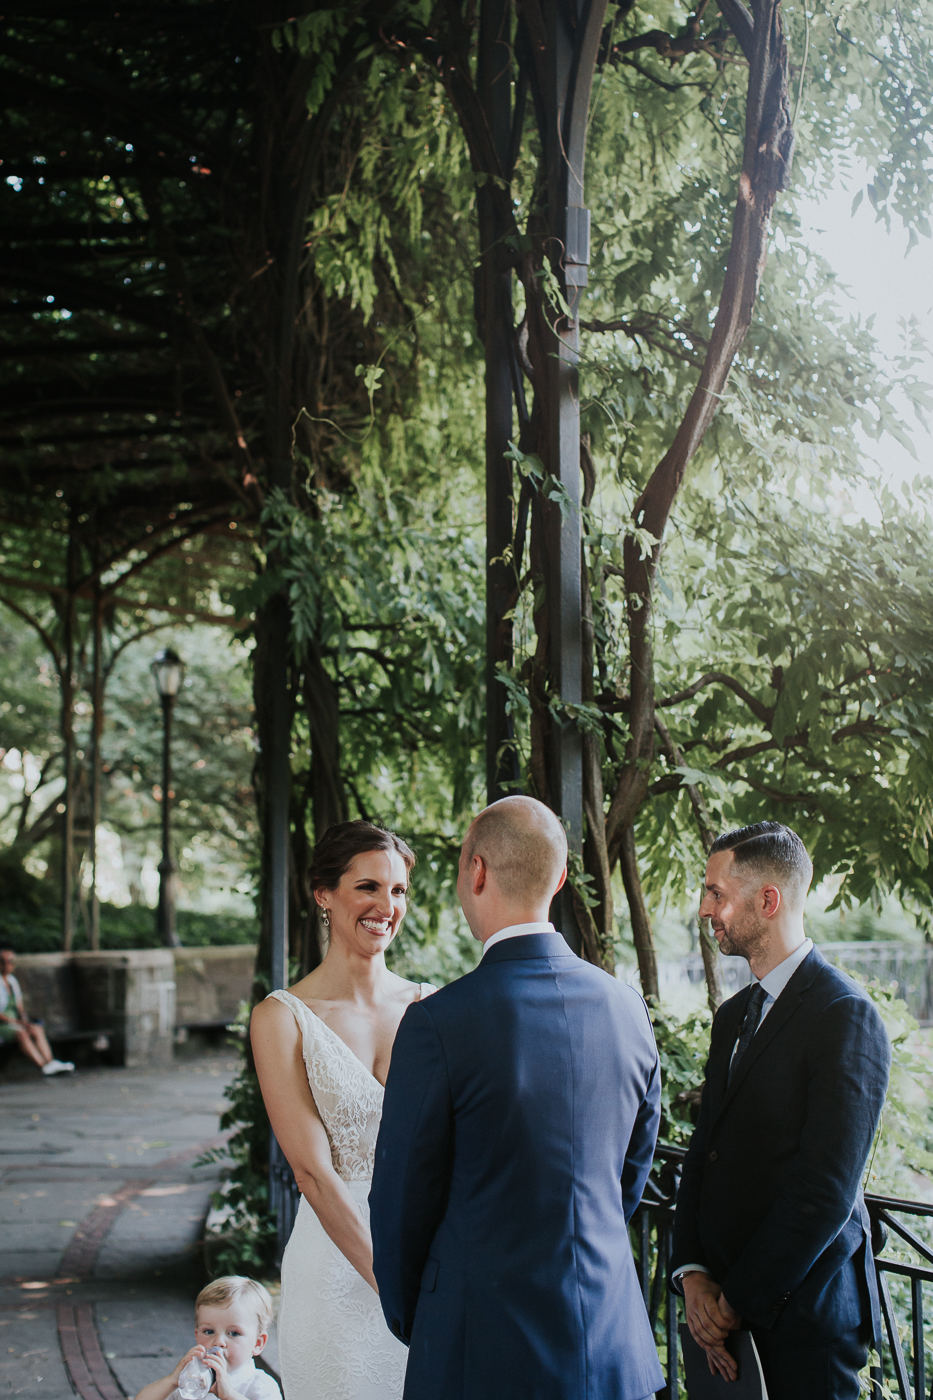 NYC-Central-Park-Conservatory-Garden-Intimate-Elopement-Documentary-Wedding-Photographer-24.jpg